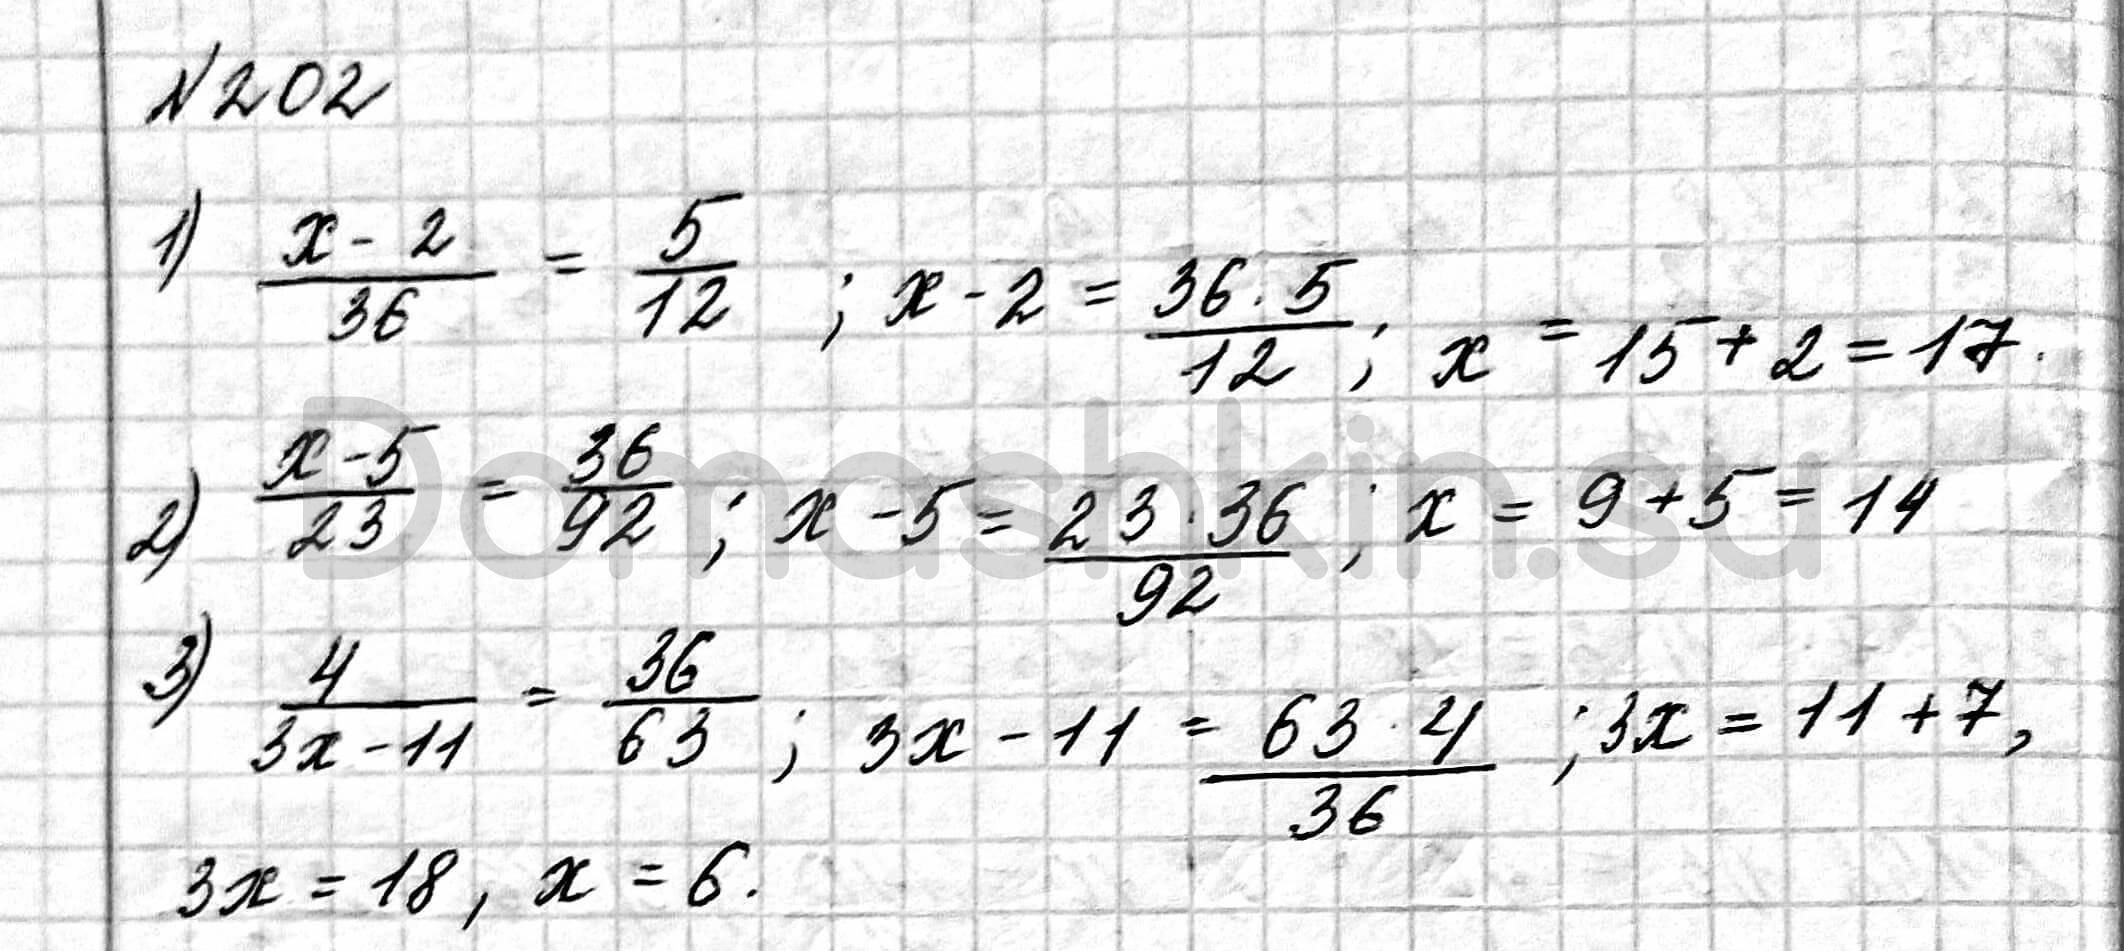 Математика 6 класс учебник Мерзляк номер 202 решение